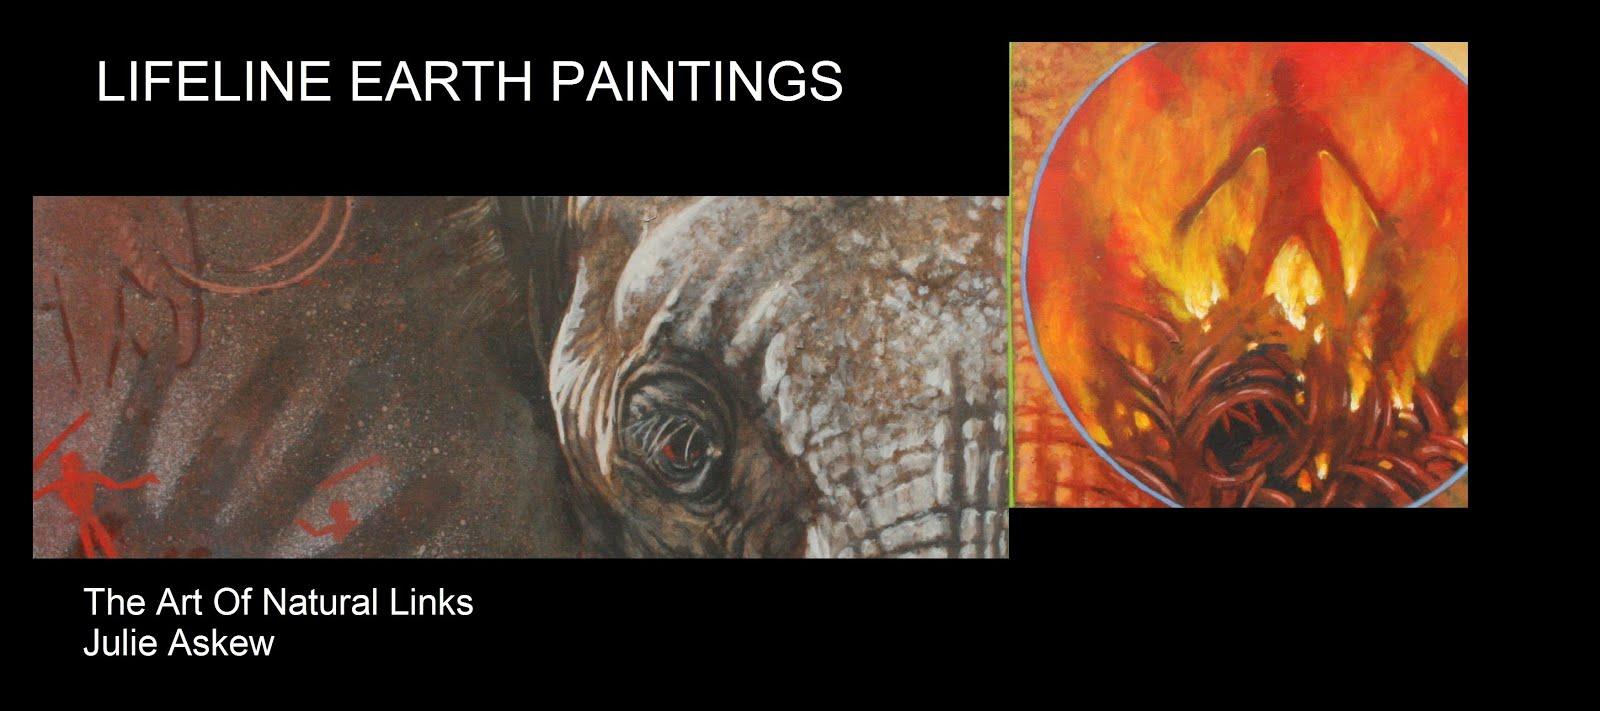 Lifeline Earth Paintings